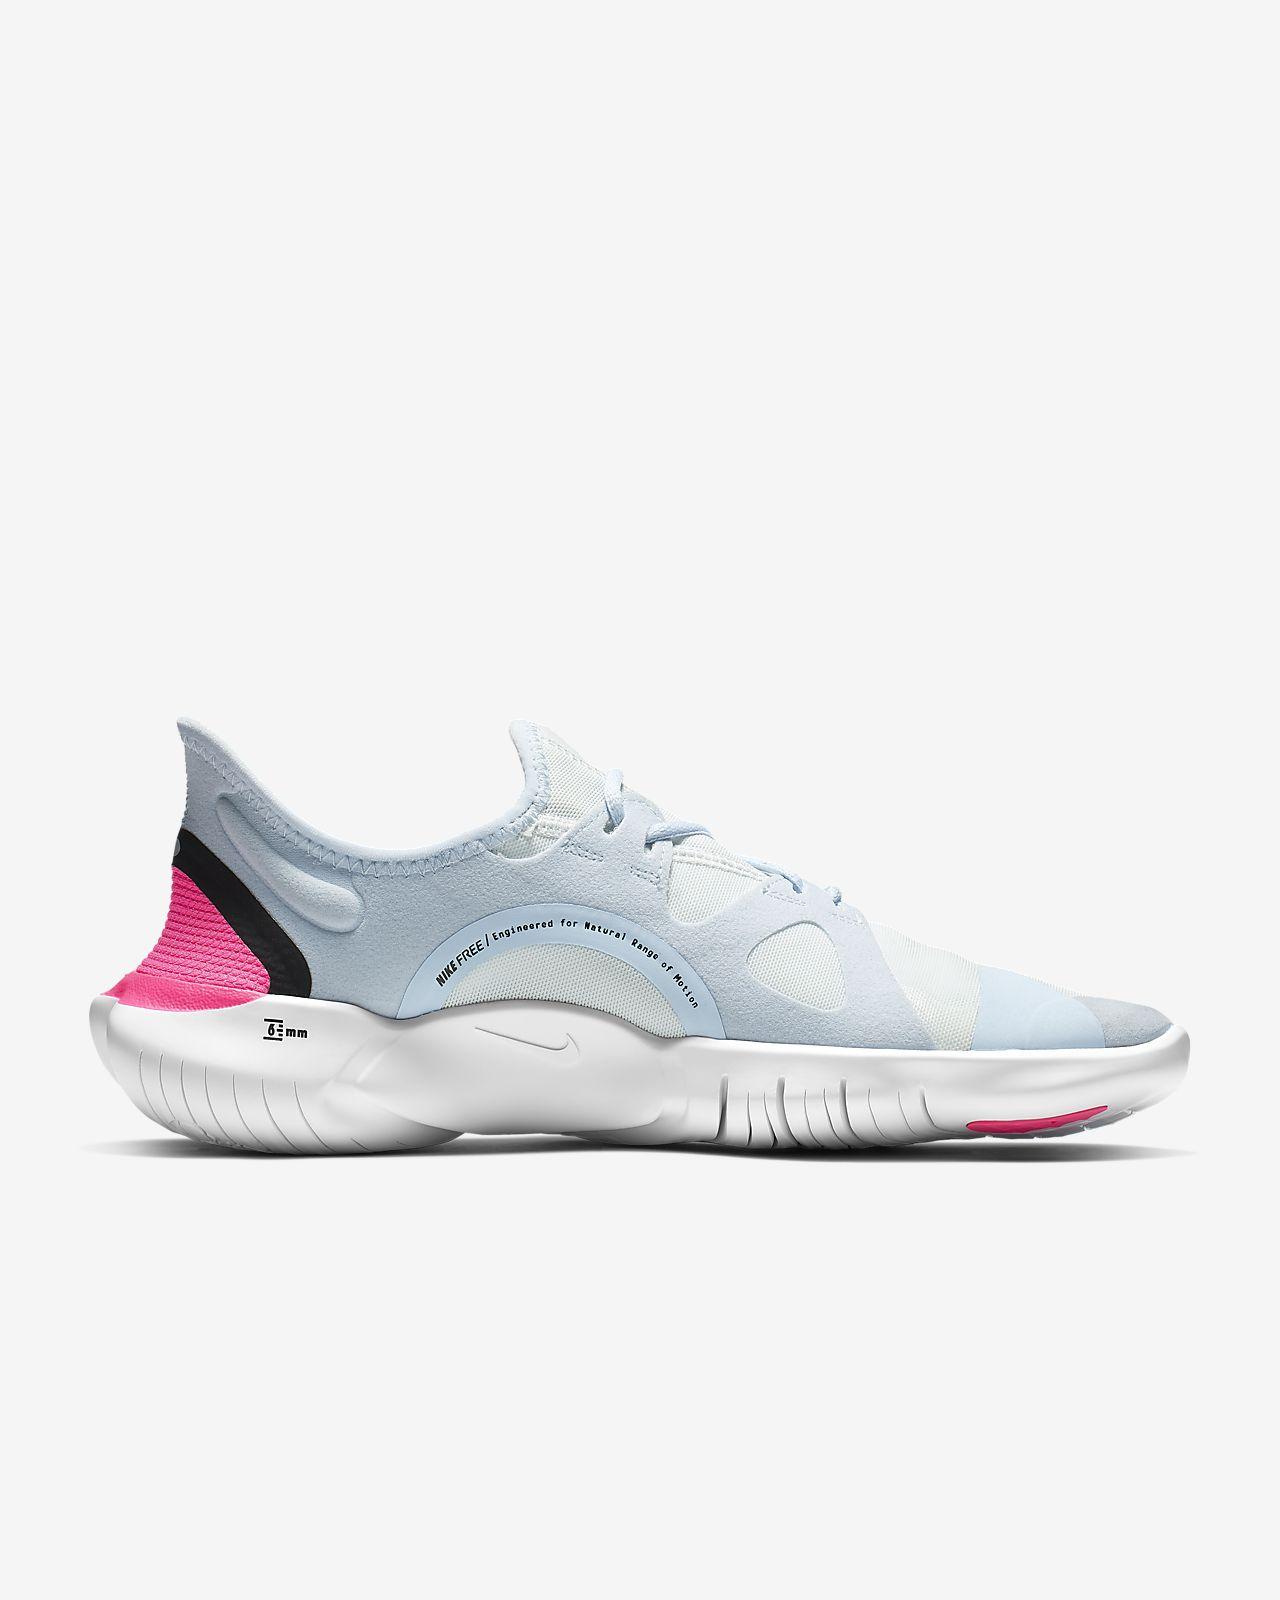 Nike Free RN 5.0 Schuhe Laufschuhe Running Damen AQ1316 101 Weiß